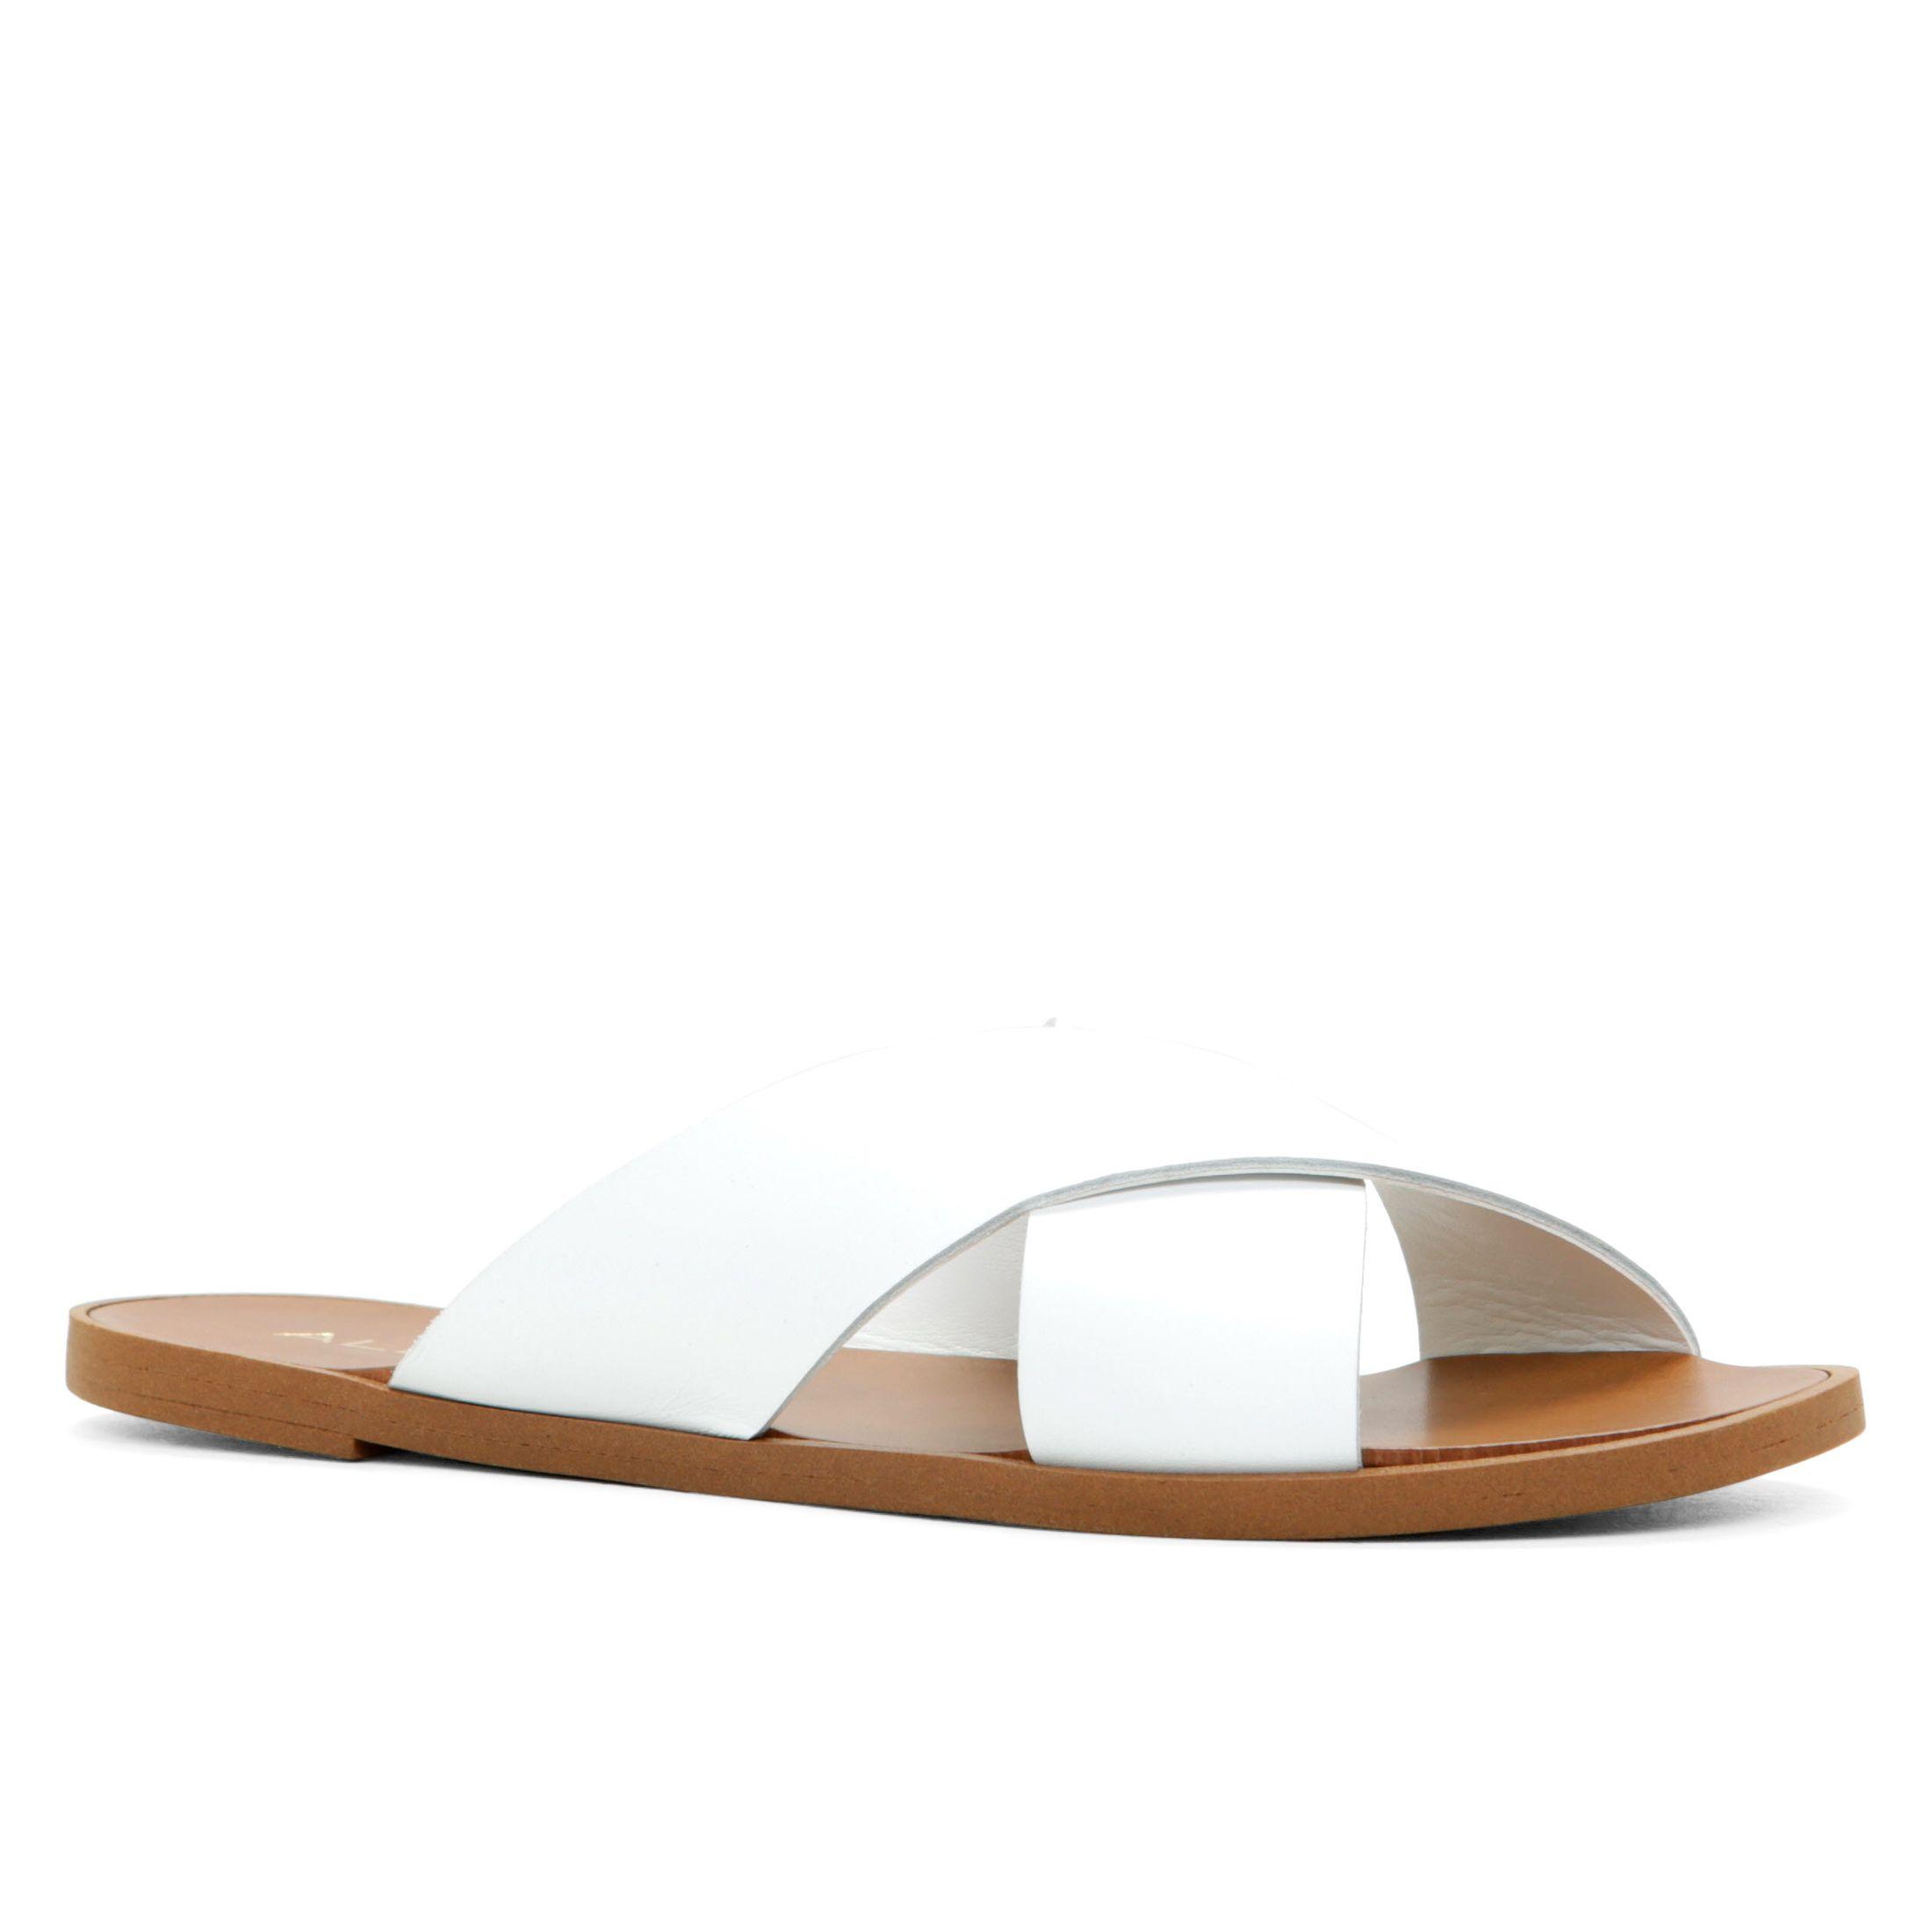 3cd5295ebe4c Aldo Hinshaw Slip-on Sandals in Metallic - Lyst